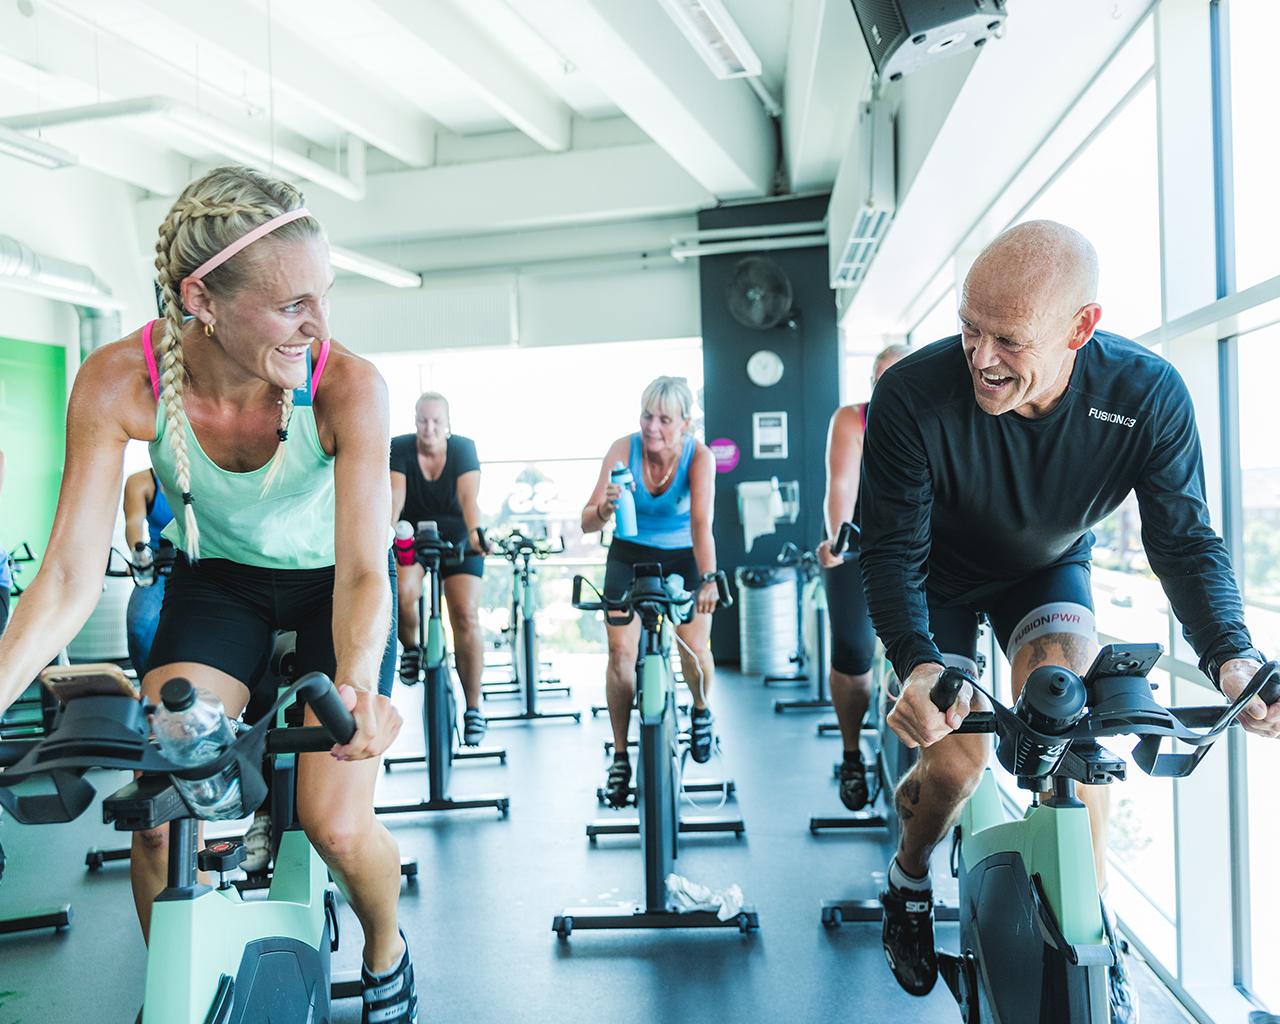 Åstrands et-punktstest: Konditionstest på cykel 🚴♀️